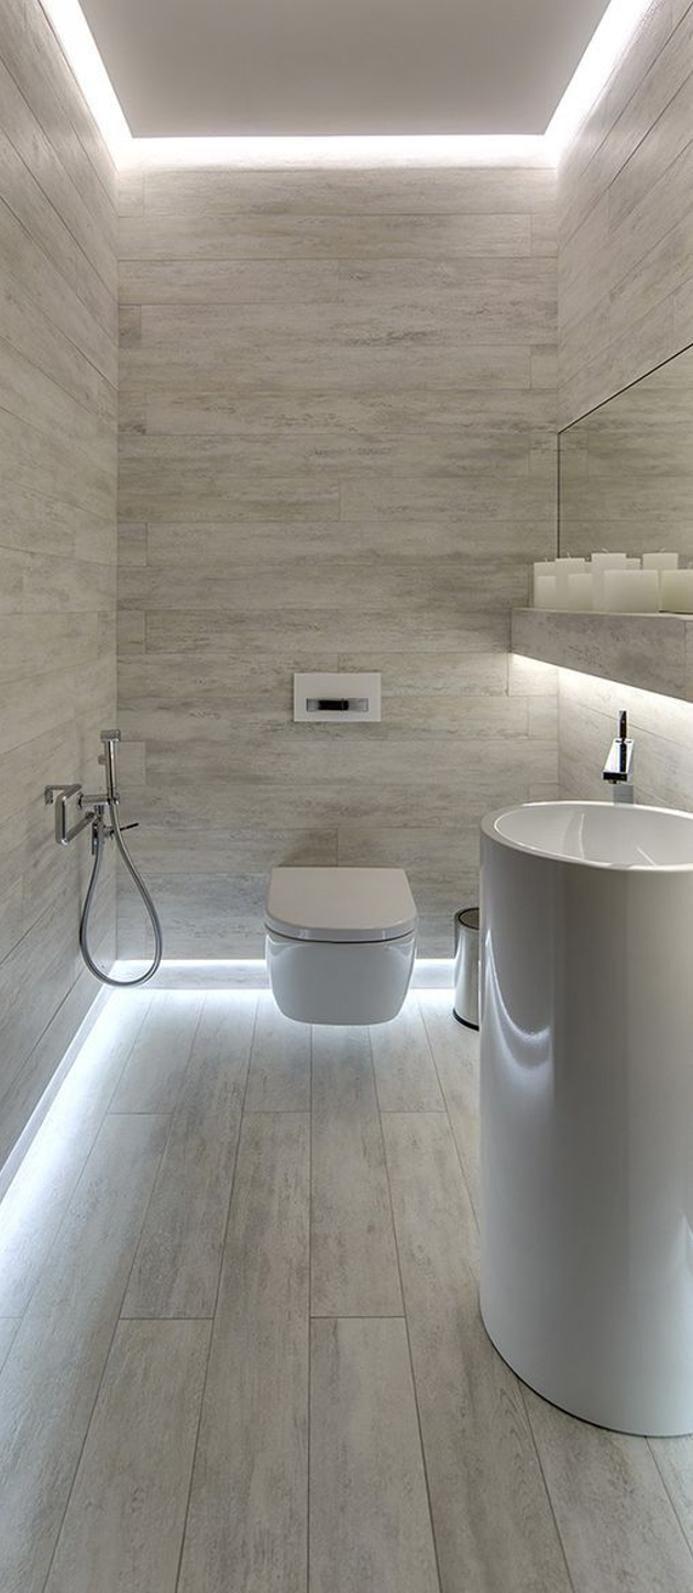 10 Lighting Design Ideas For Your Home More Ith Your Vanity Or Bar Can Create A More Co Bathroom Design Inspiration Bathroom Interior Modern Bathroom Design